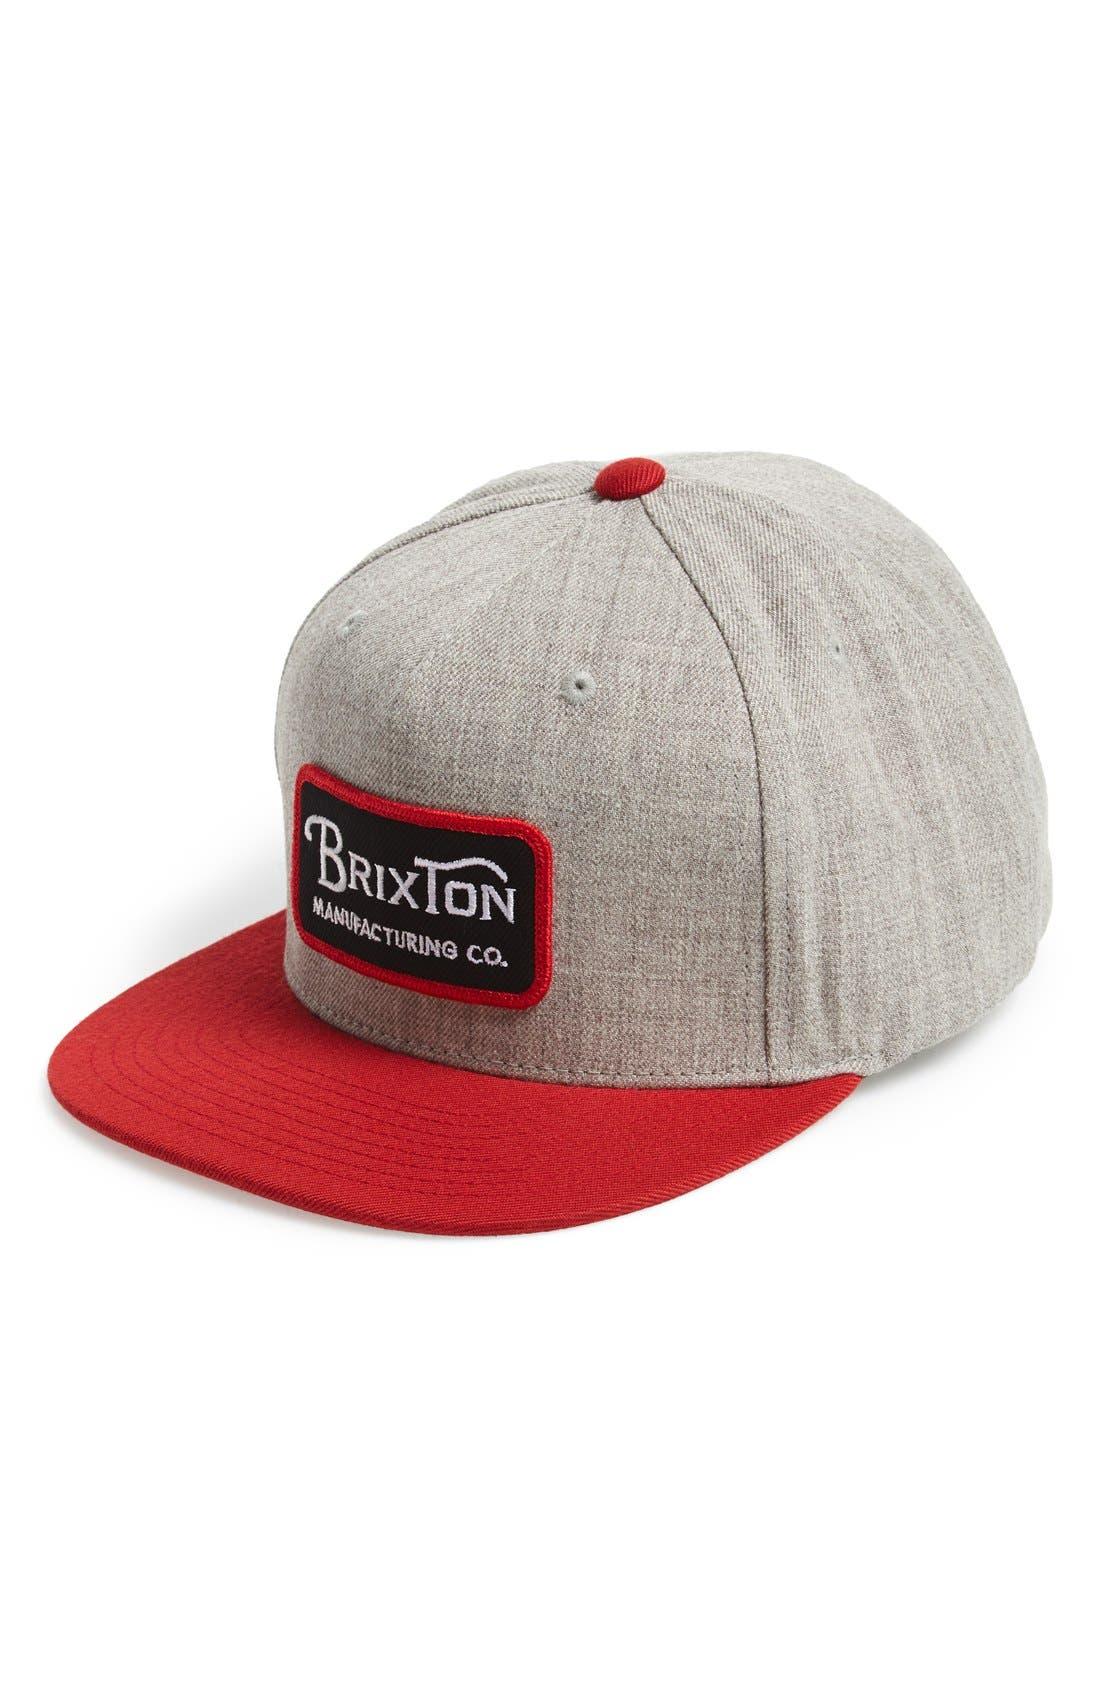 Alternate Image 1 Selected - Brixton 'Grade' Snapback Cap